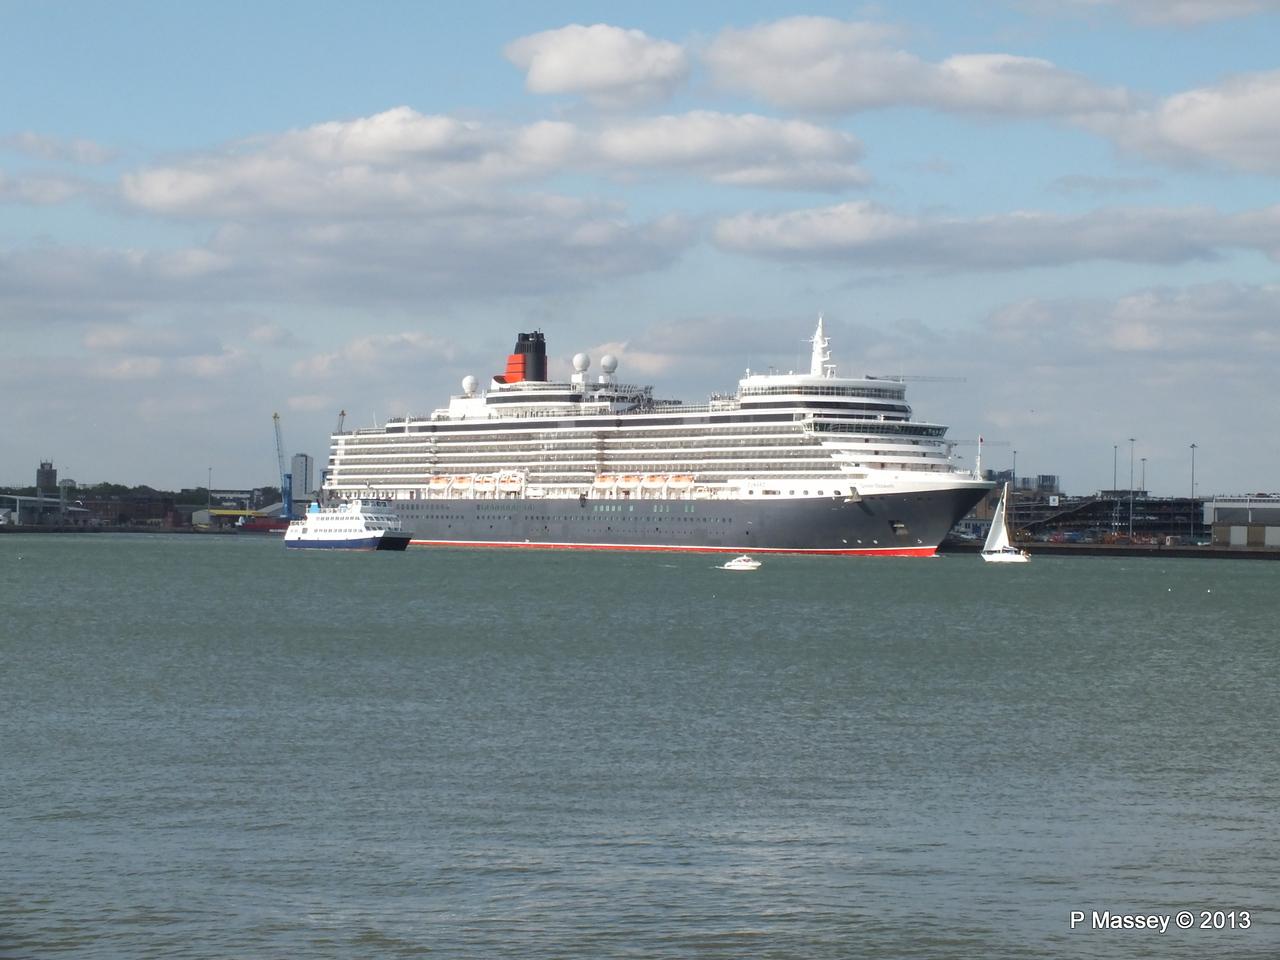 QUEEN ELIZABETH Departing Southampton OCEAN SCENE PDM 10-08-2013 17-49-21